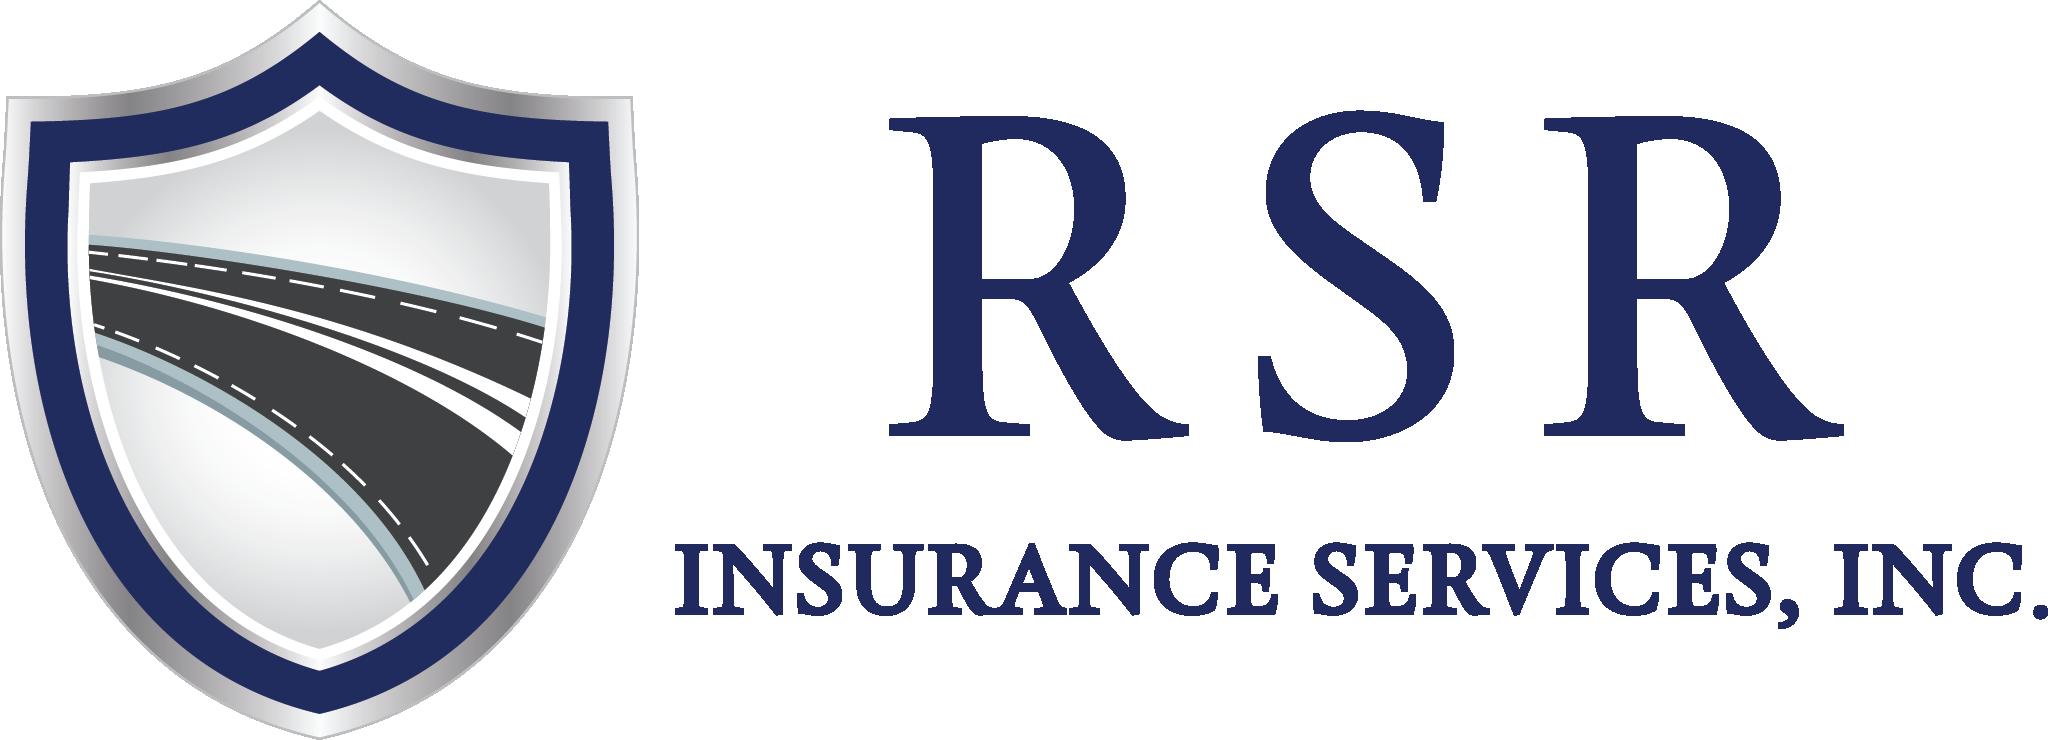 RSR Insurance Services, Inc